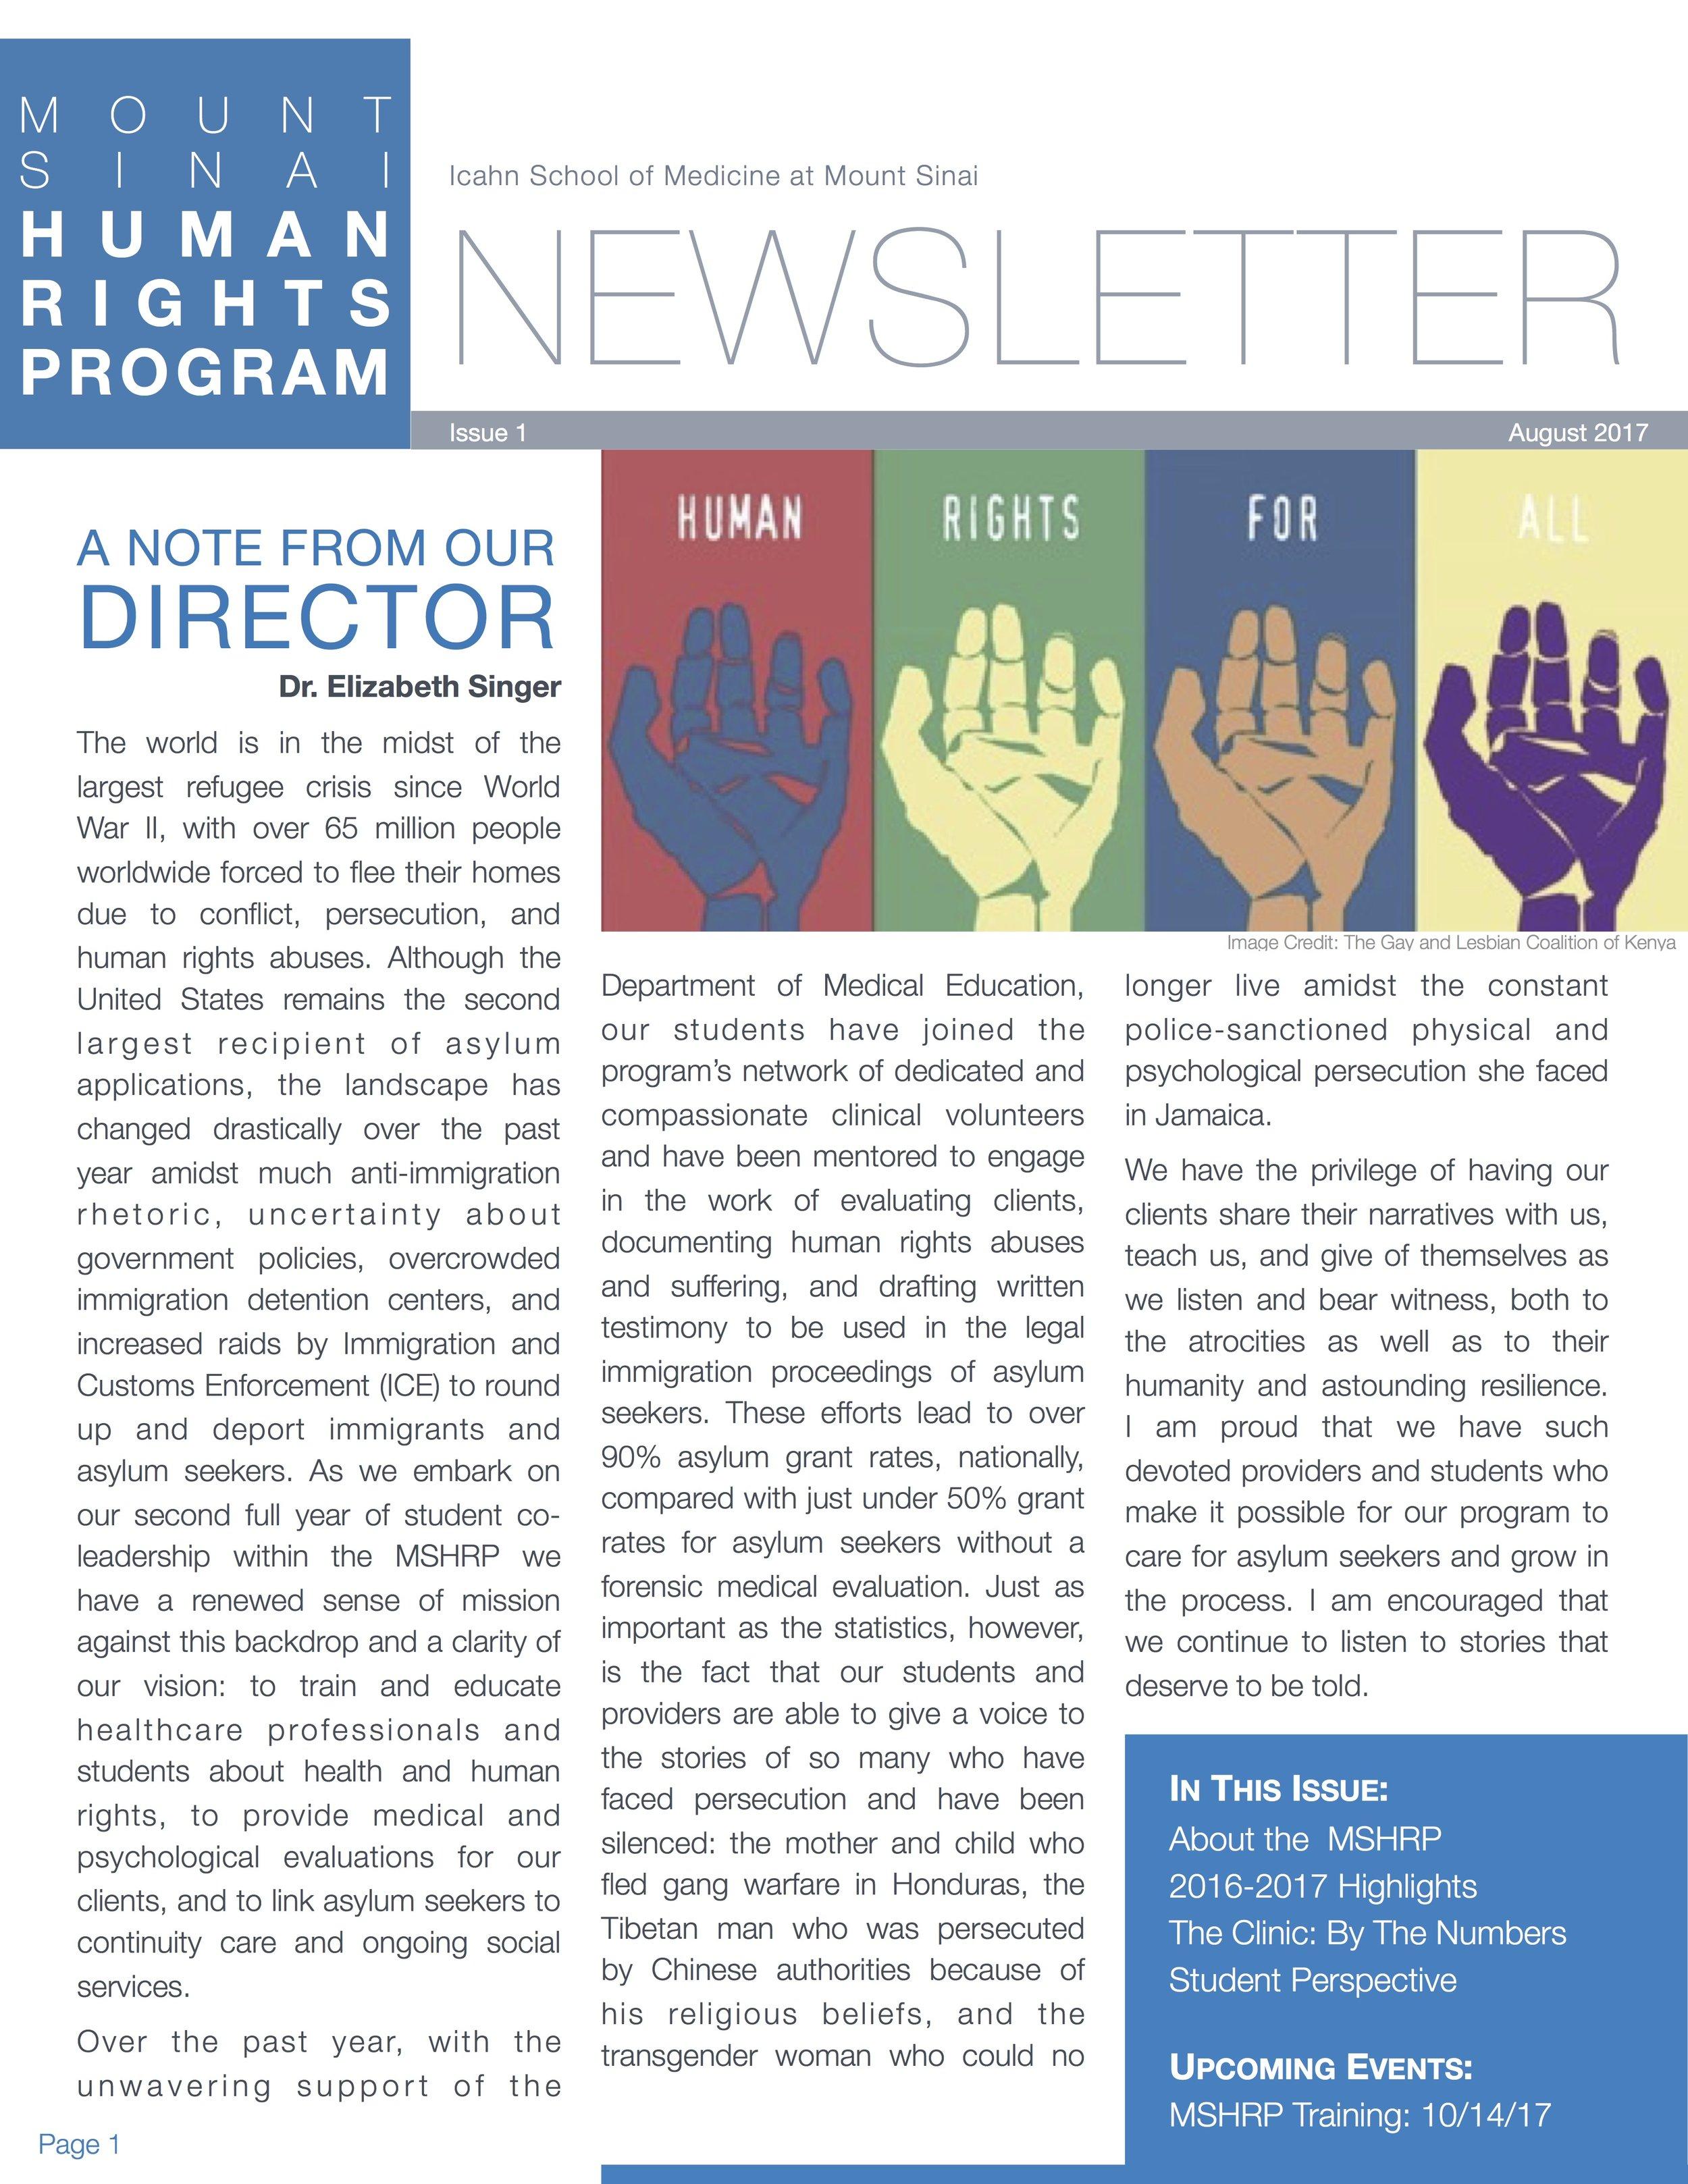 MSHRP Newsletter Aug 28 2017_FINAL (dragged).jpg